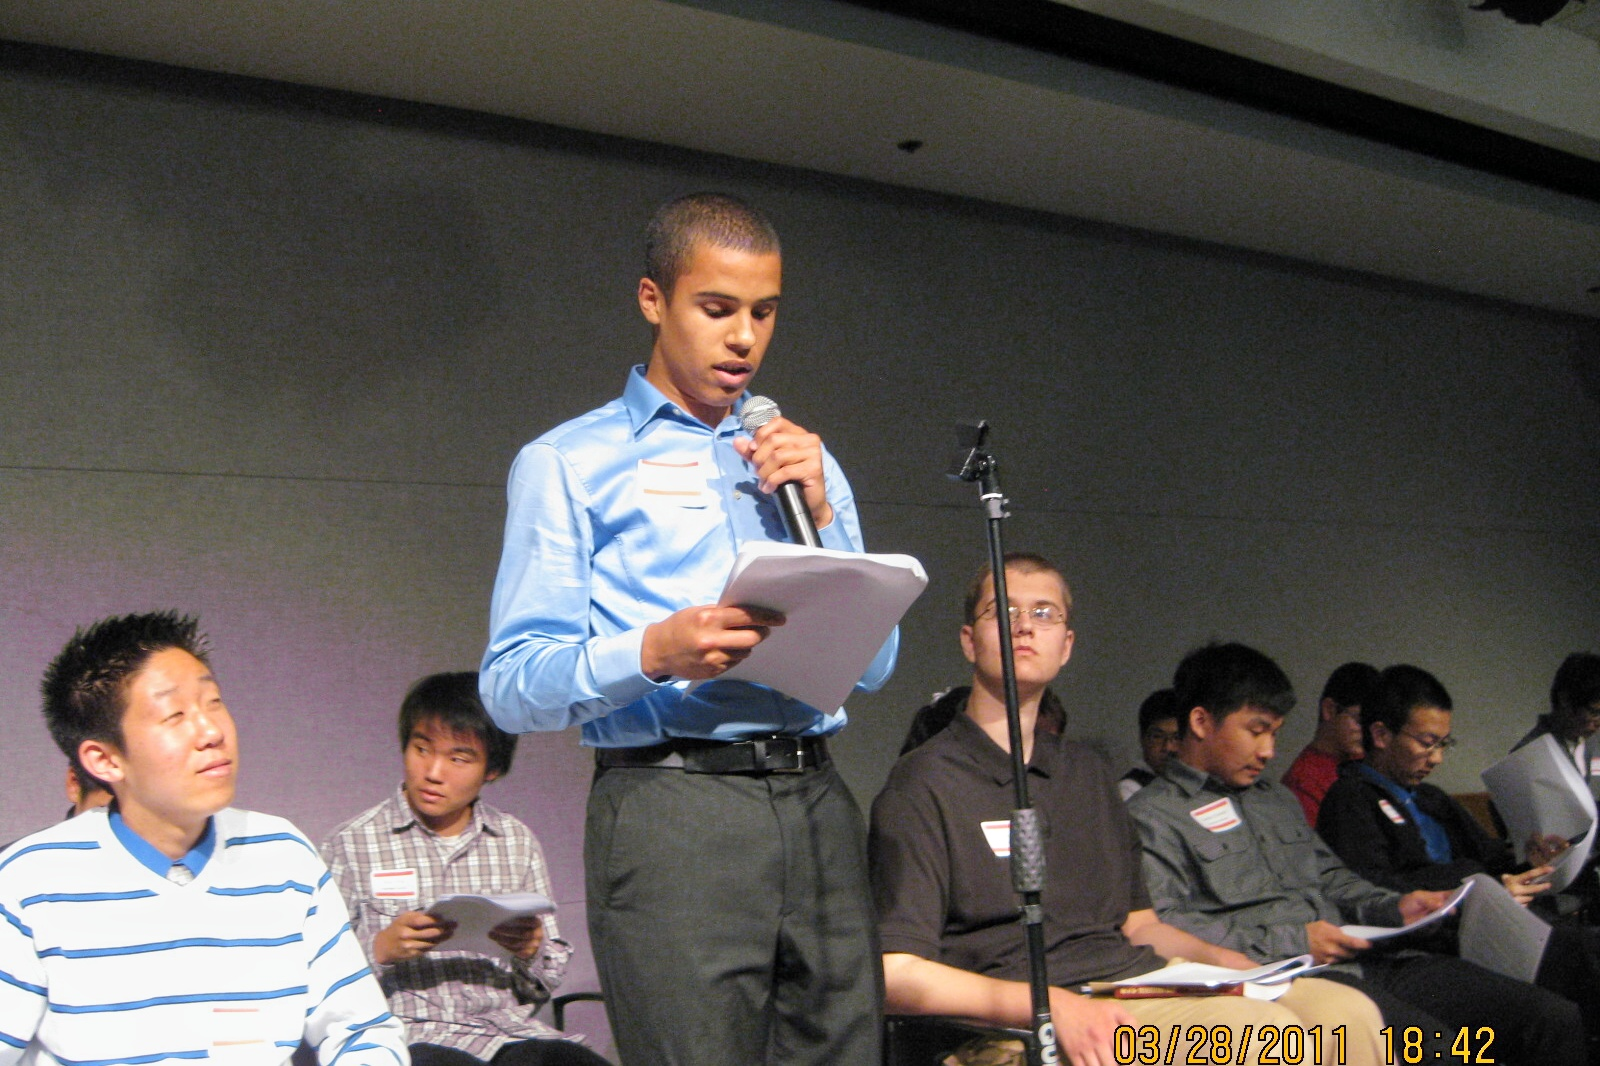 Essay unity among students